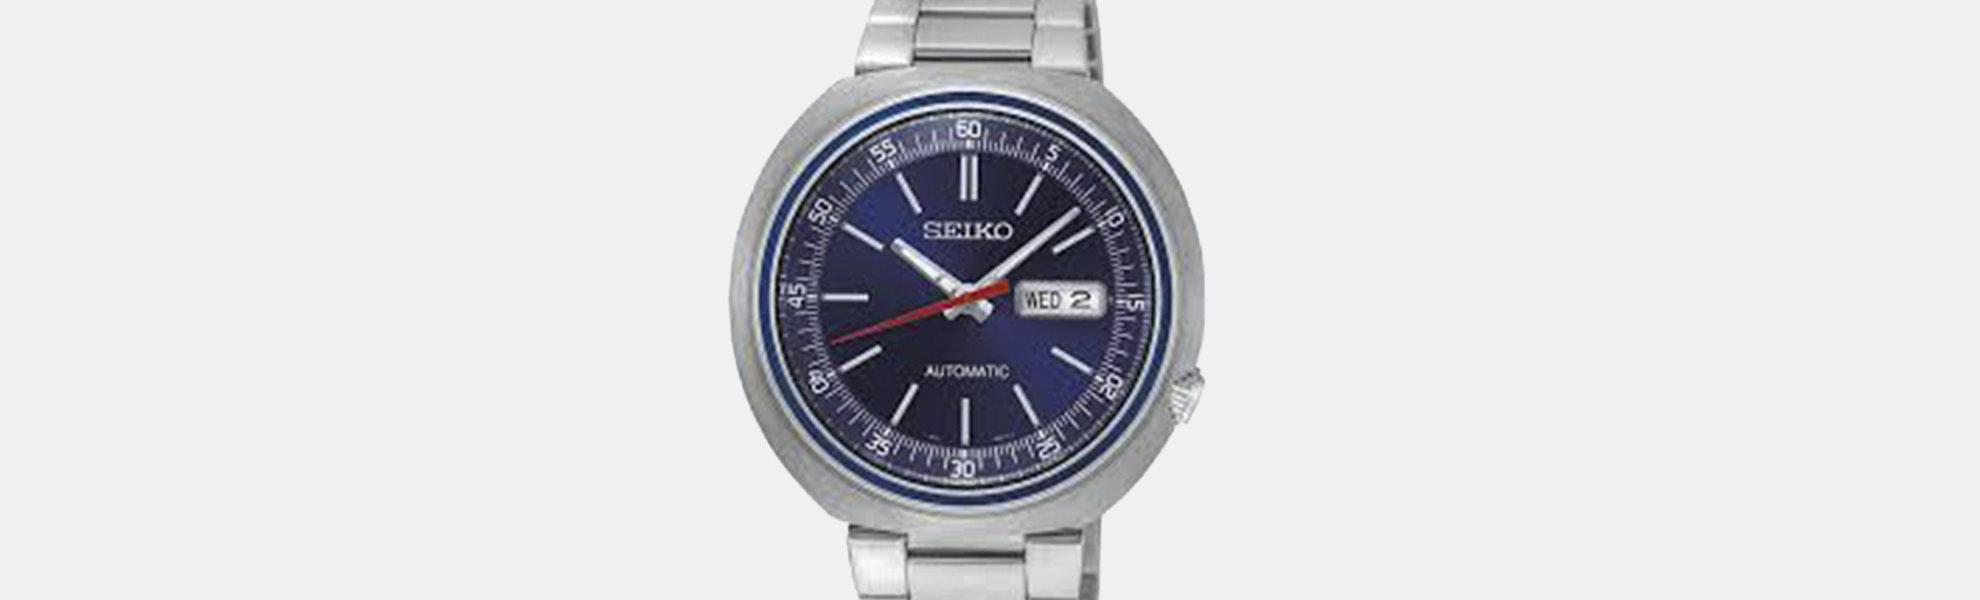 Seiko Recraft SRPC Automatic Watch